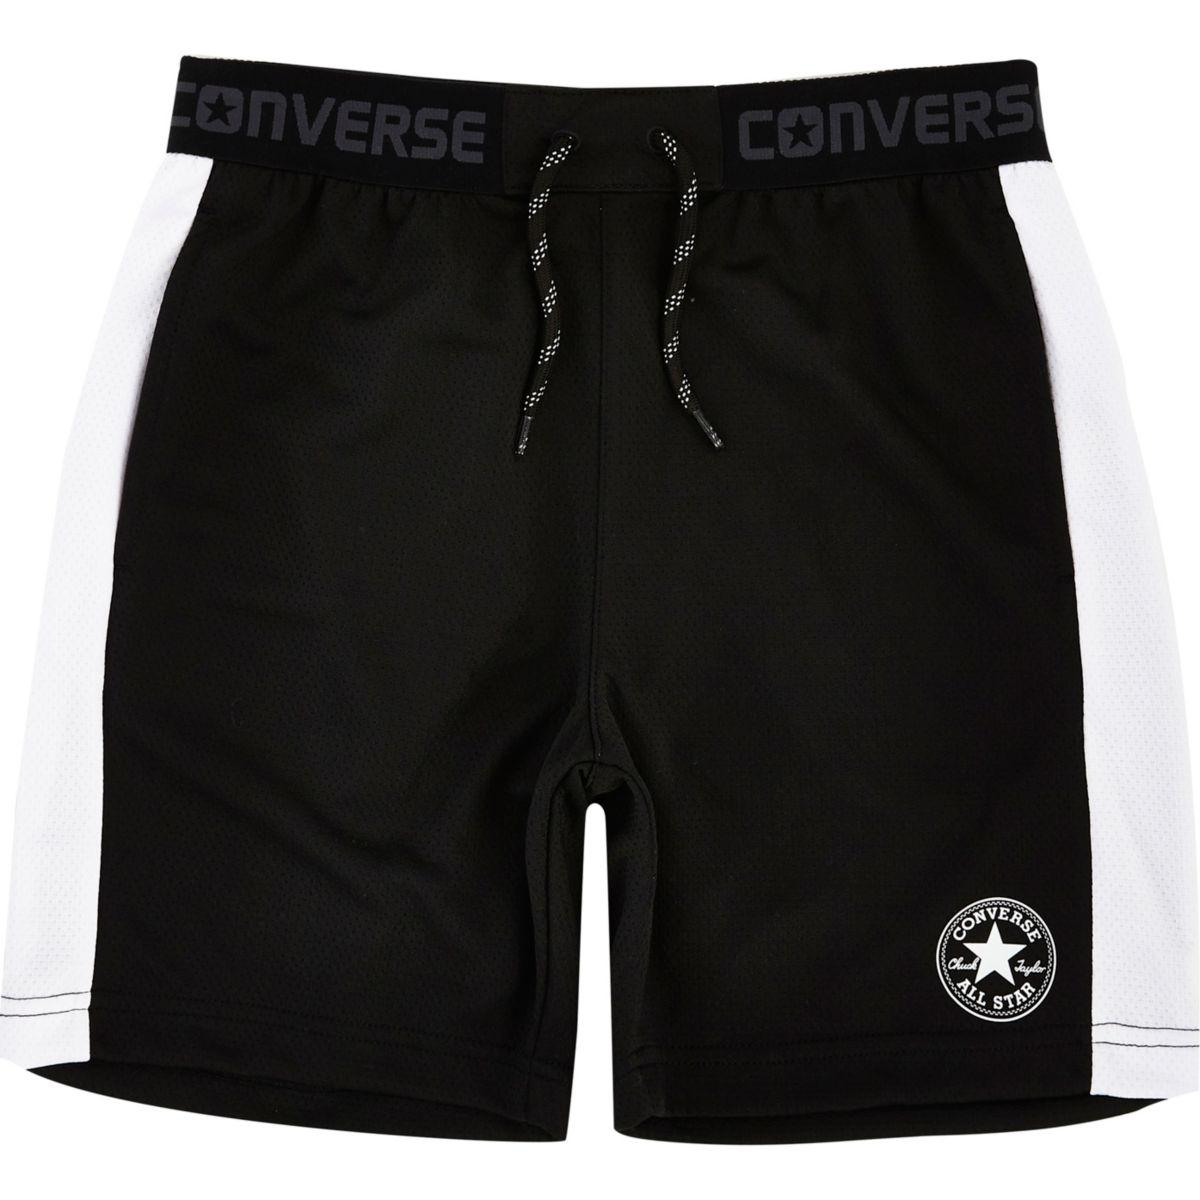 Boys Converse black shorts